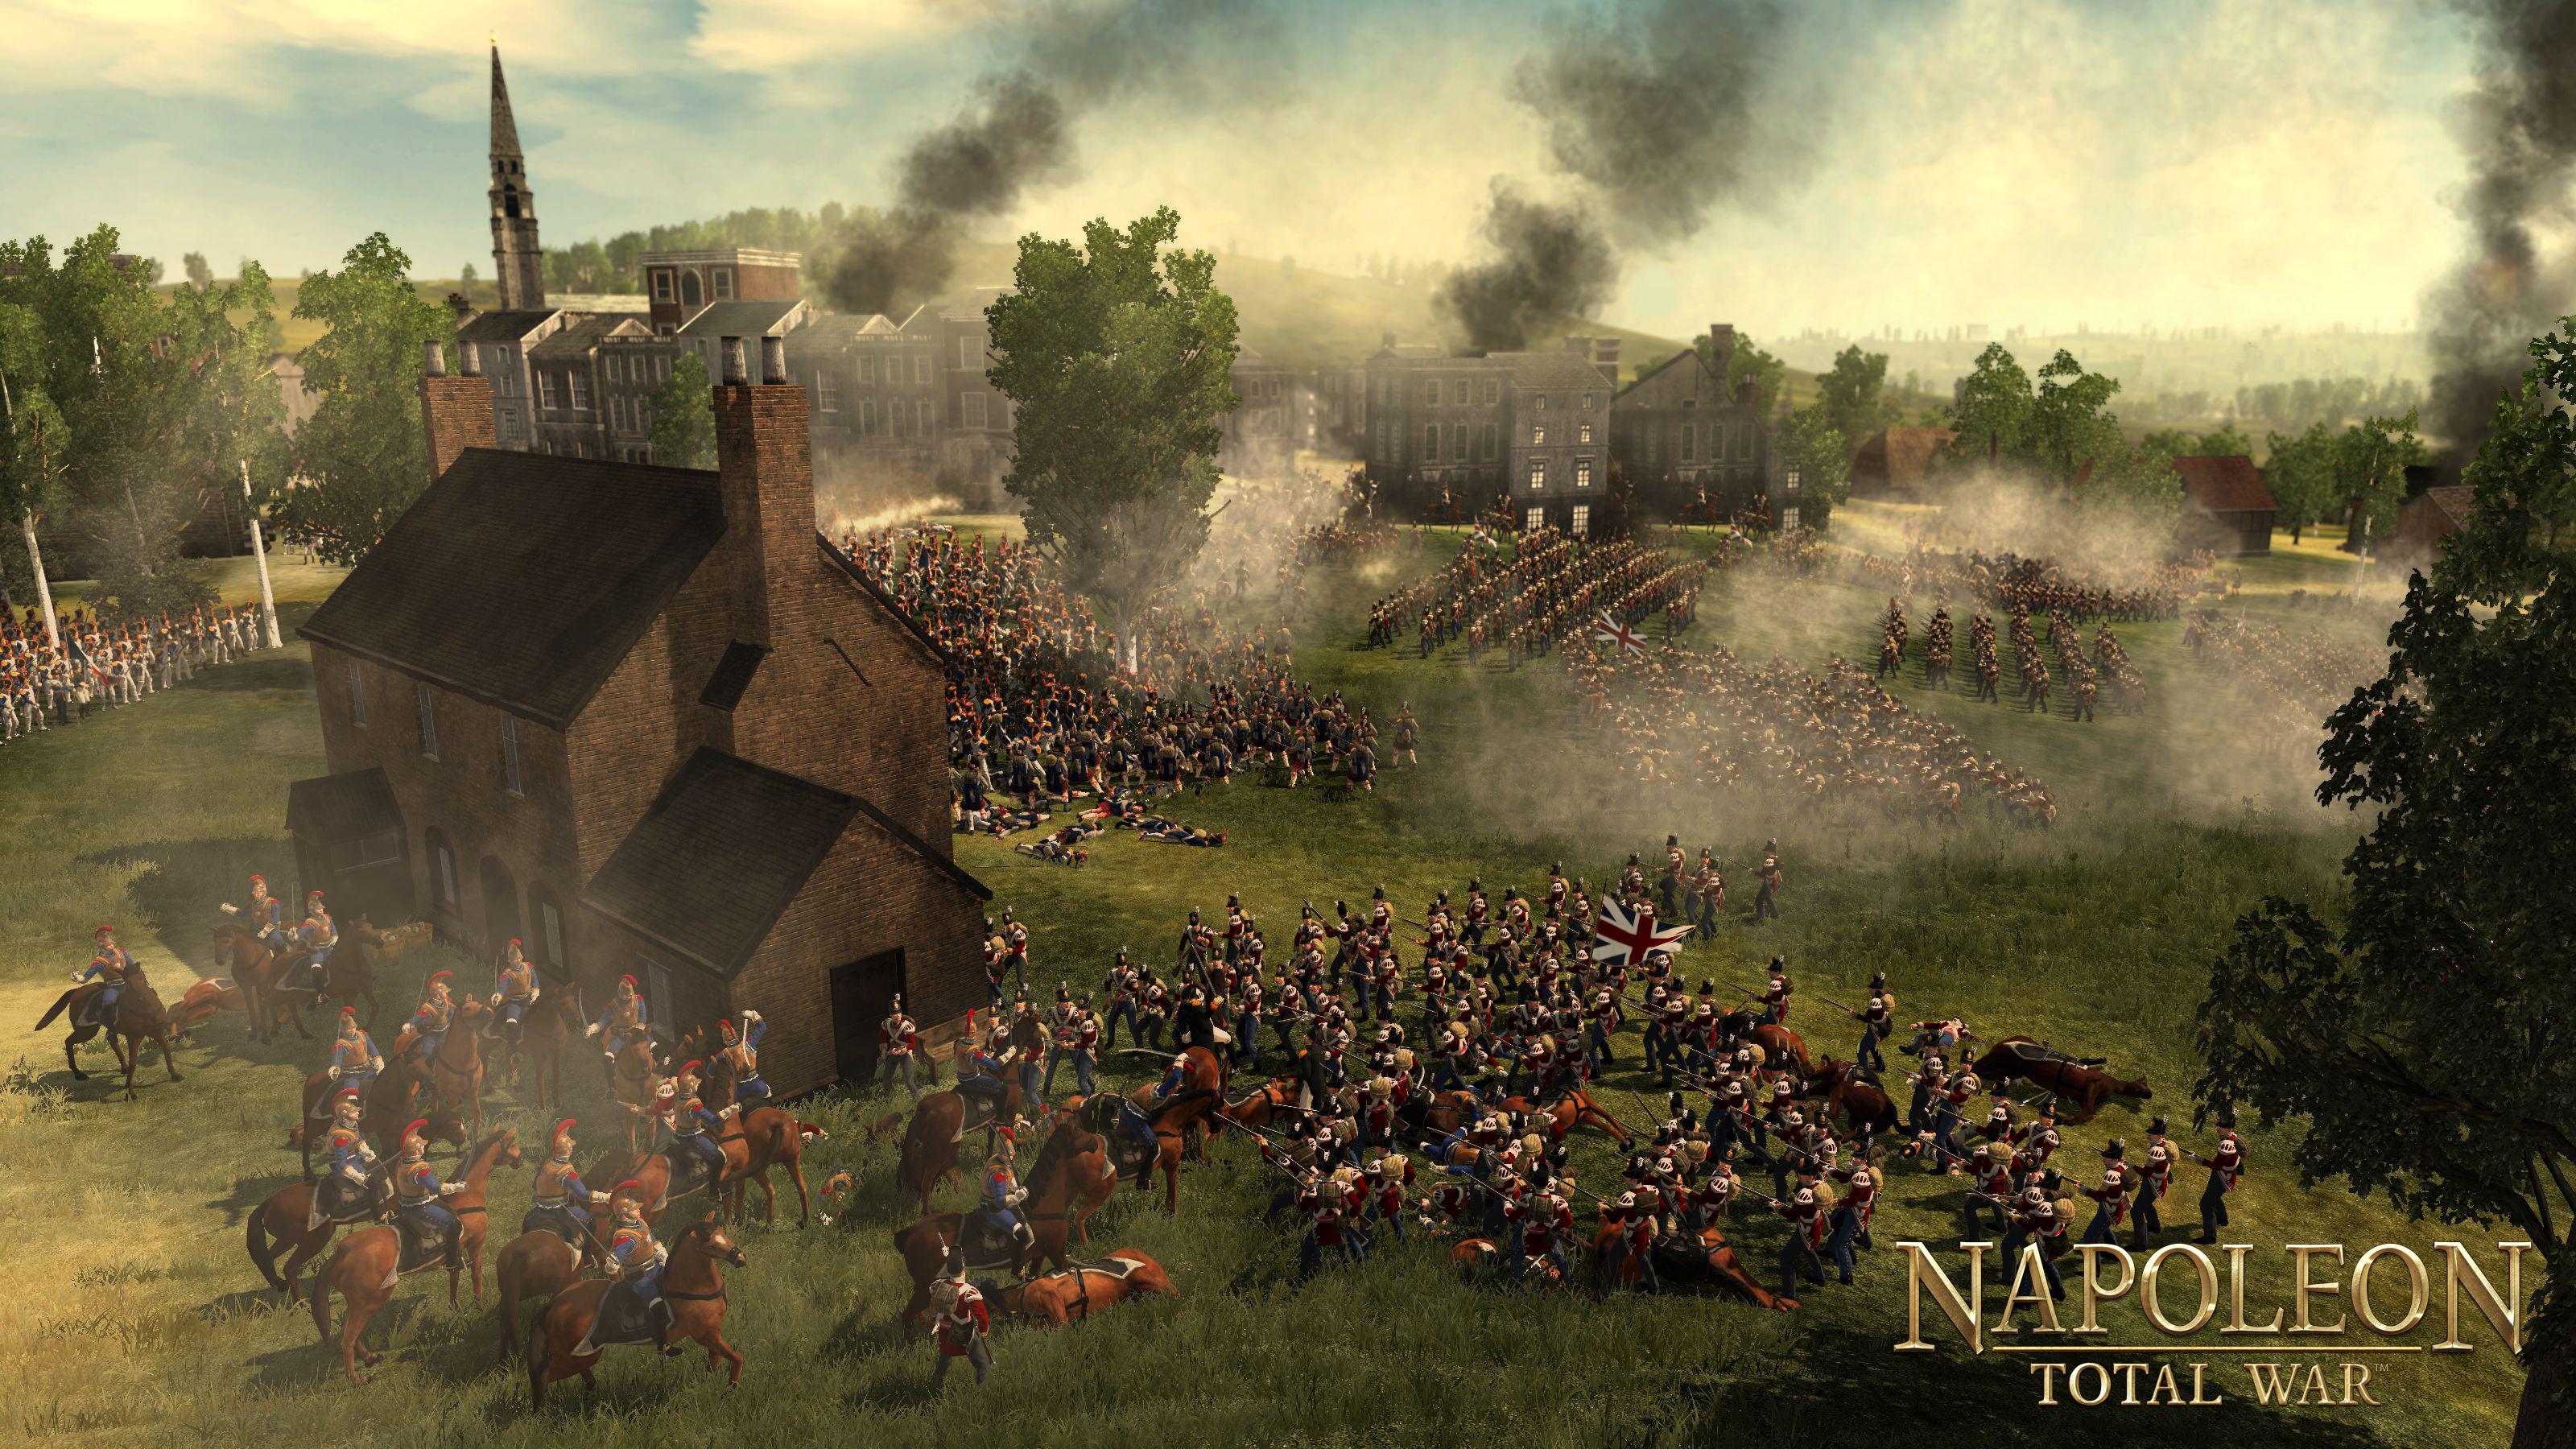 NapoleonTotalWar edit001